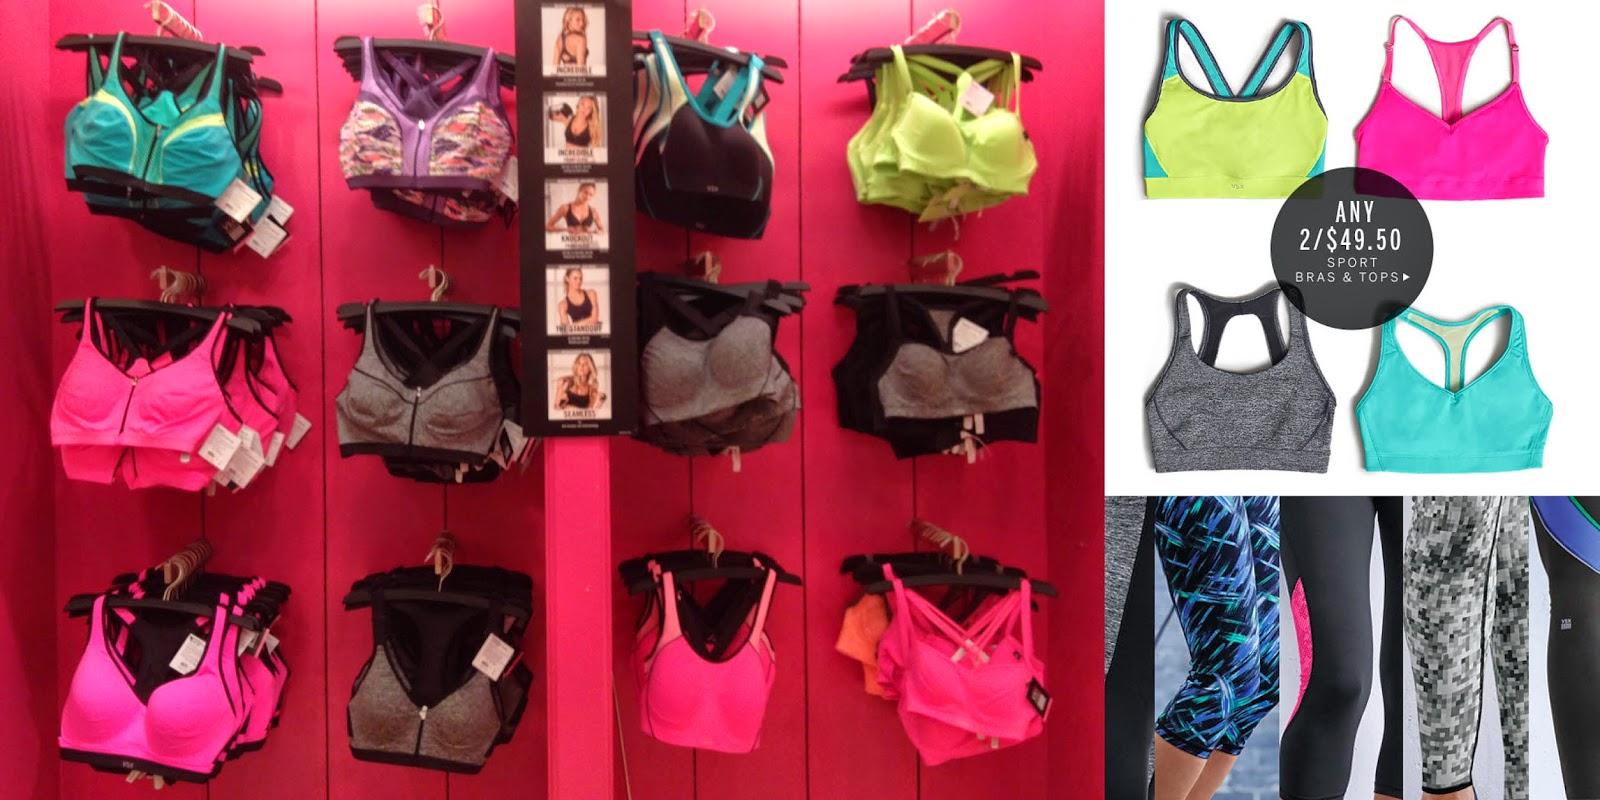 Sports Bra Stores - Backless Bra